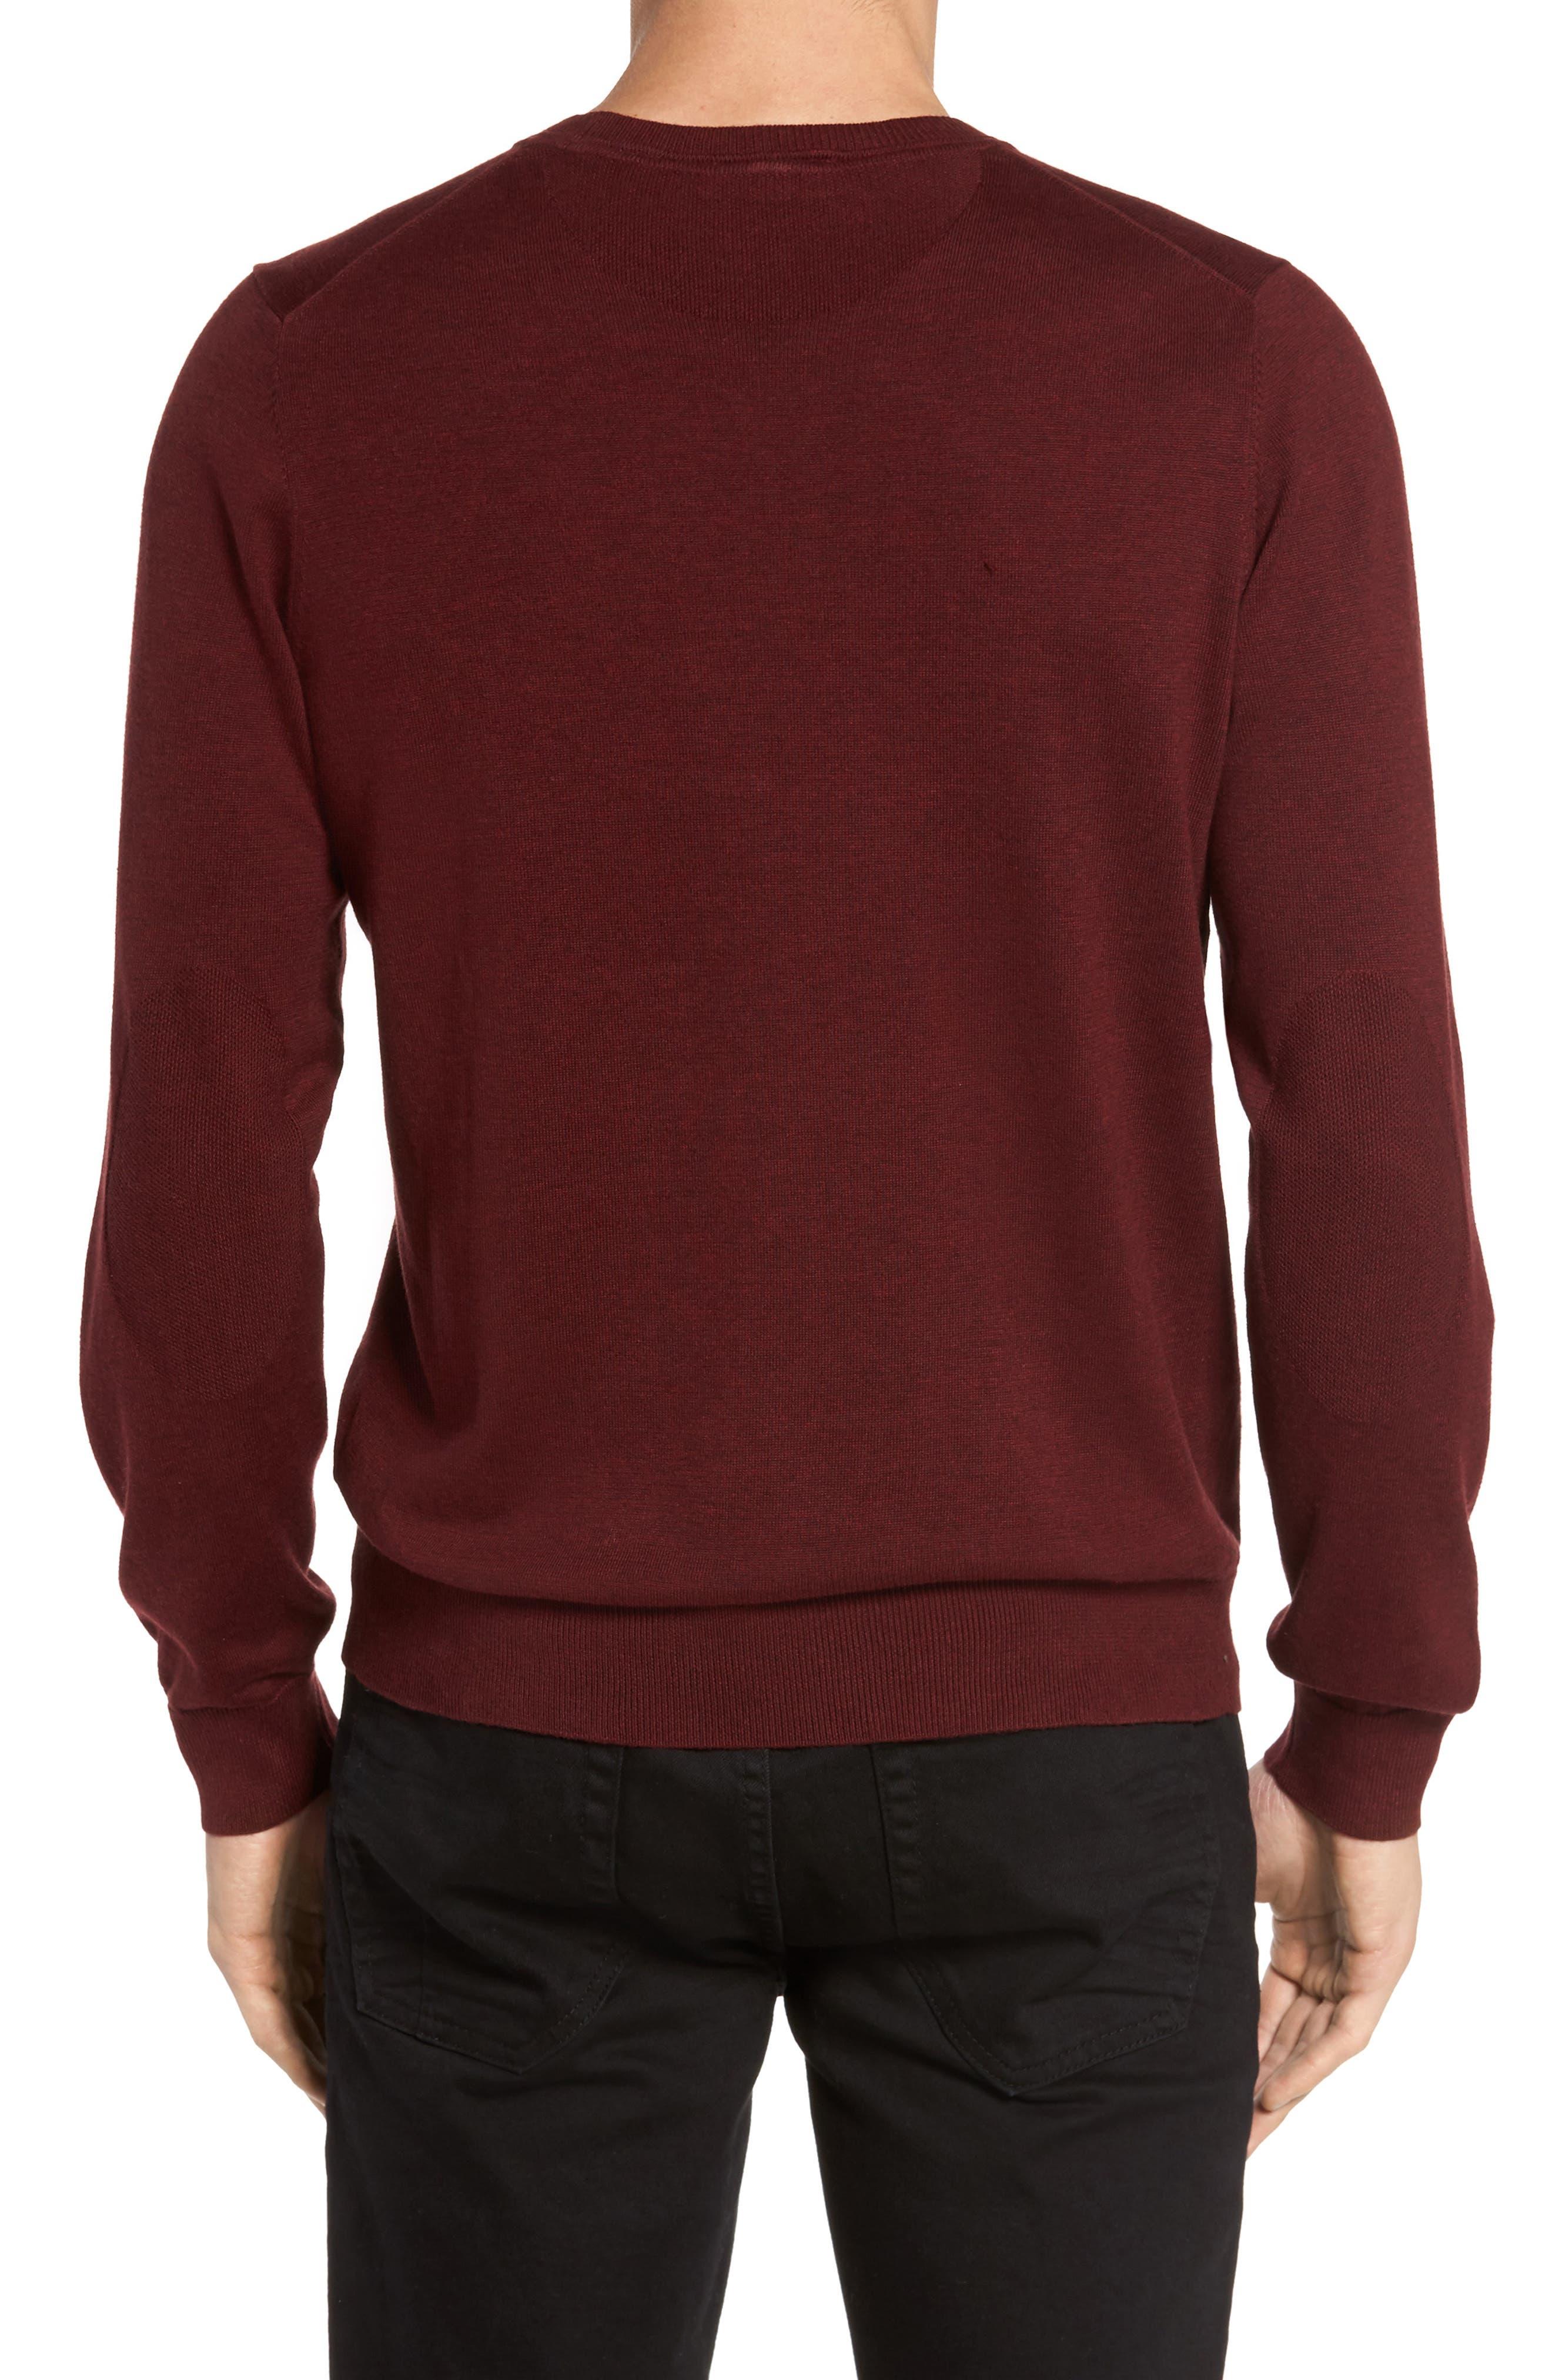 Alternate Image 2  - Lacoste Jersey Knit Crewneck Sweater